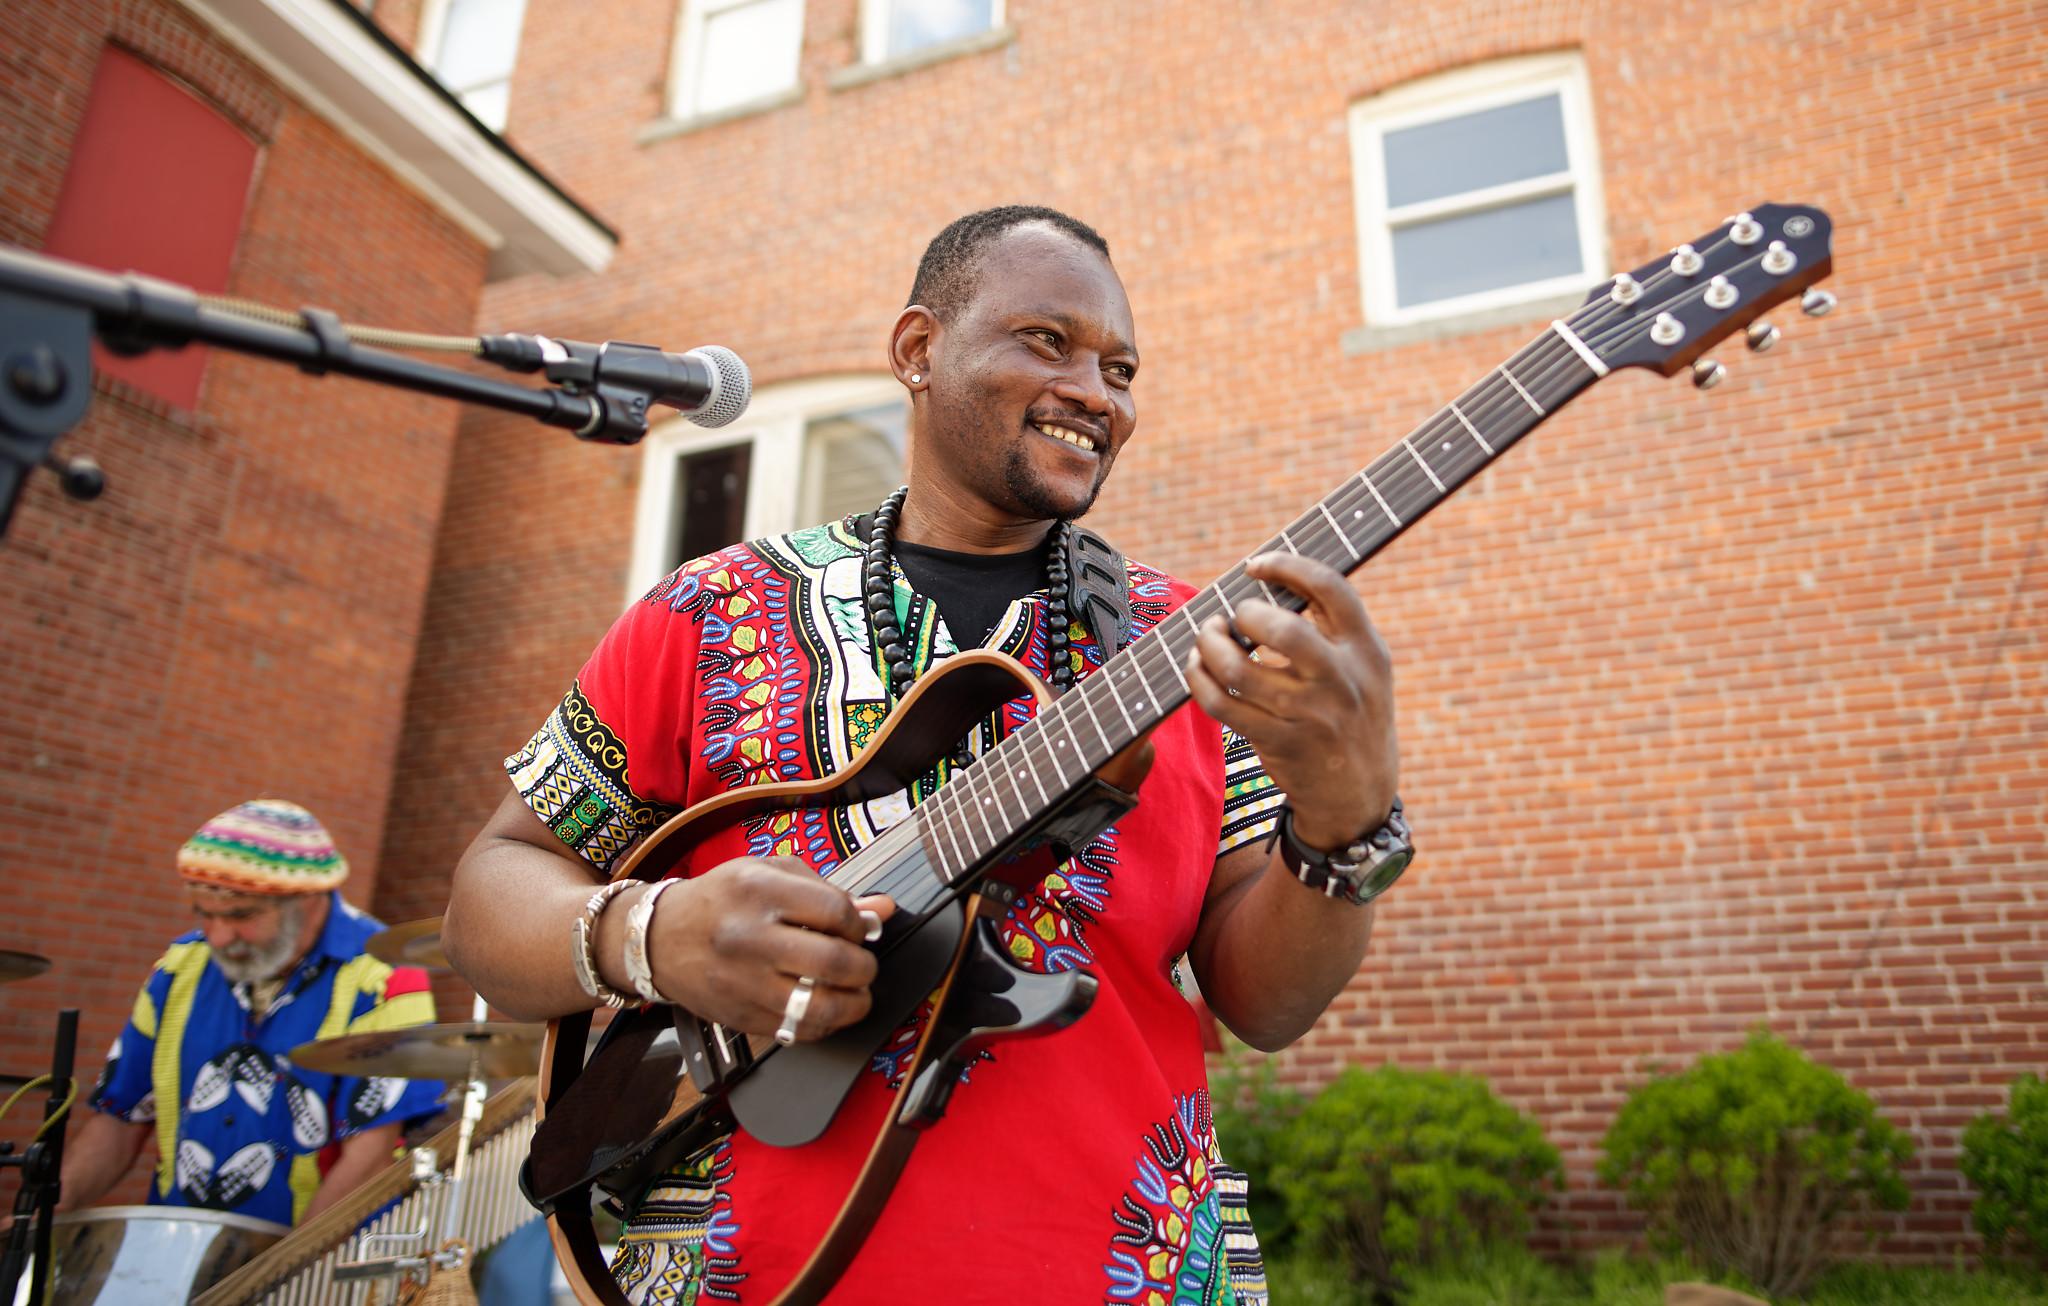 Guitarist Baba Kone from Mali via New York